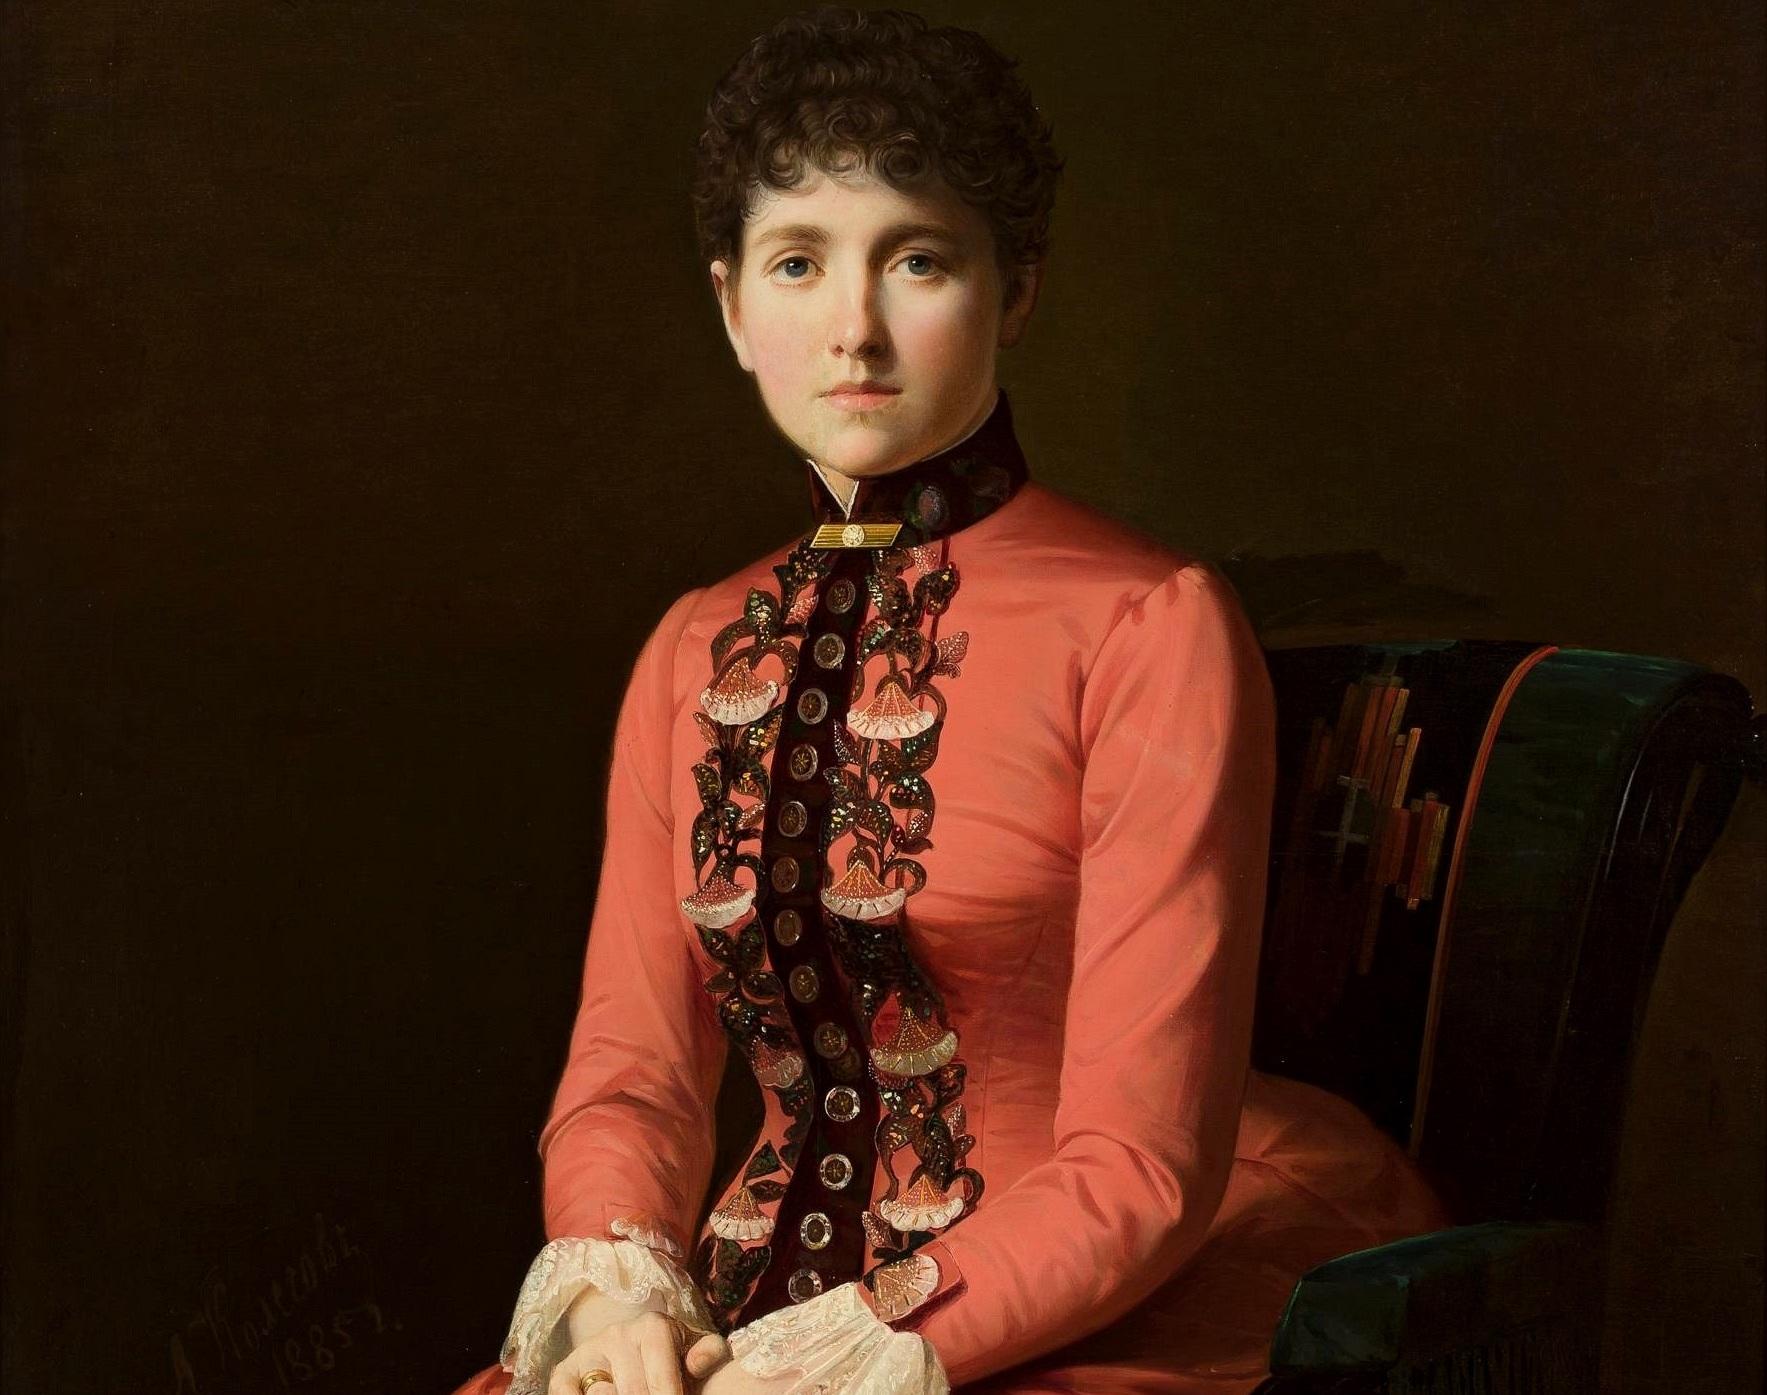 Kolesov portrait of Anna Karenina